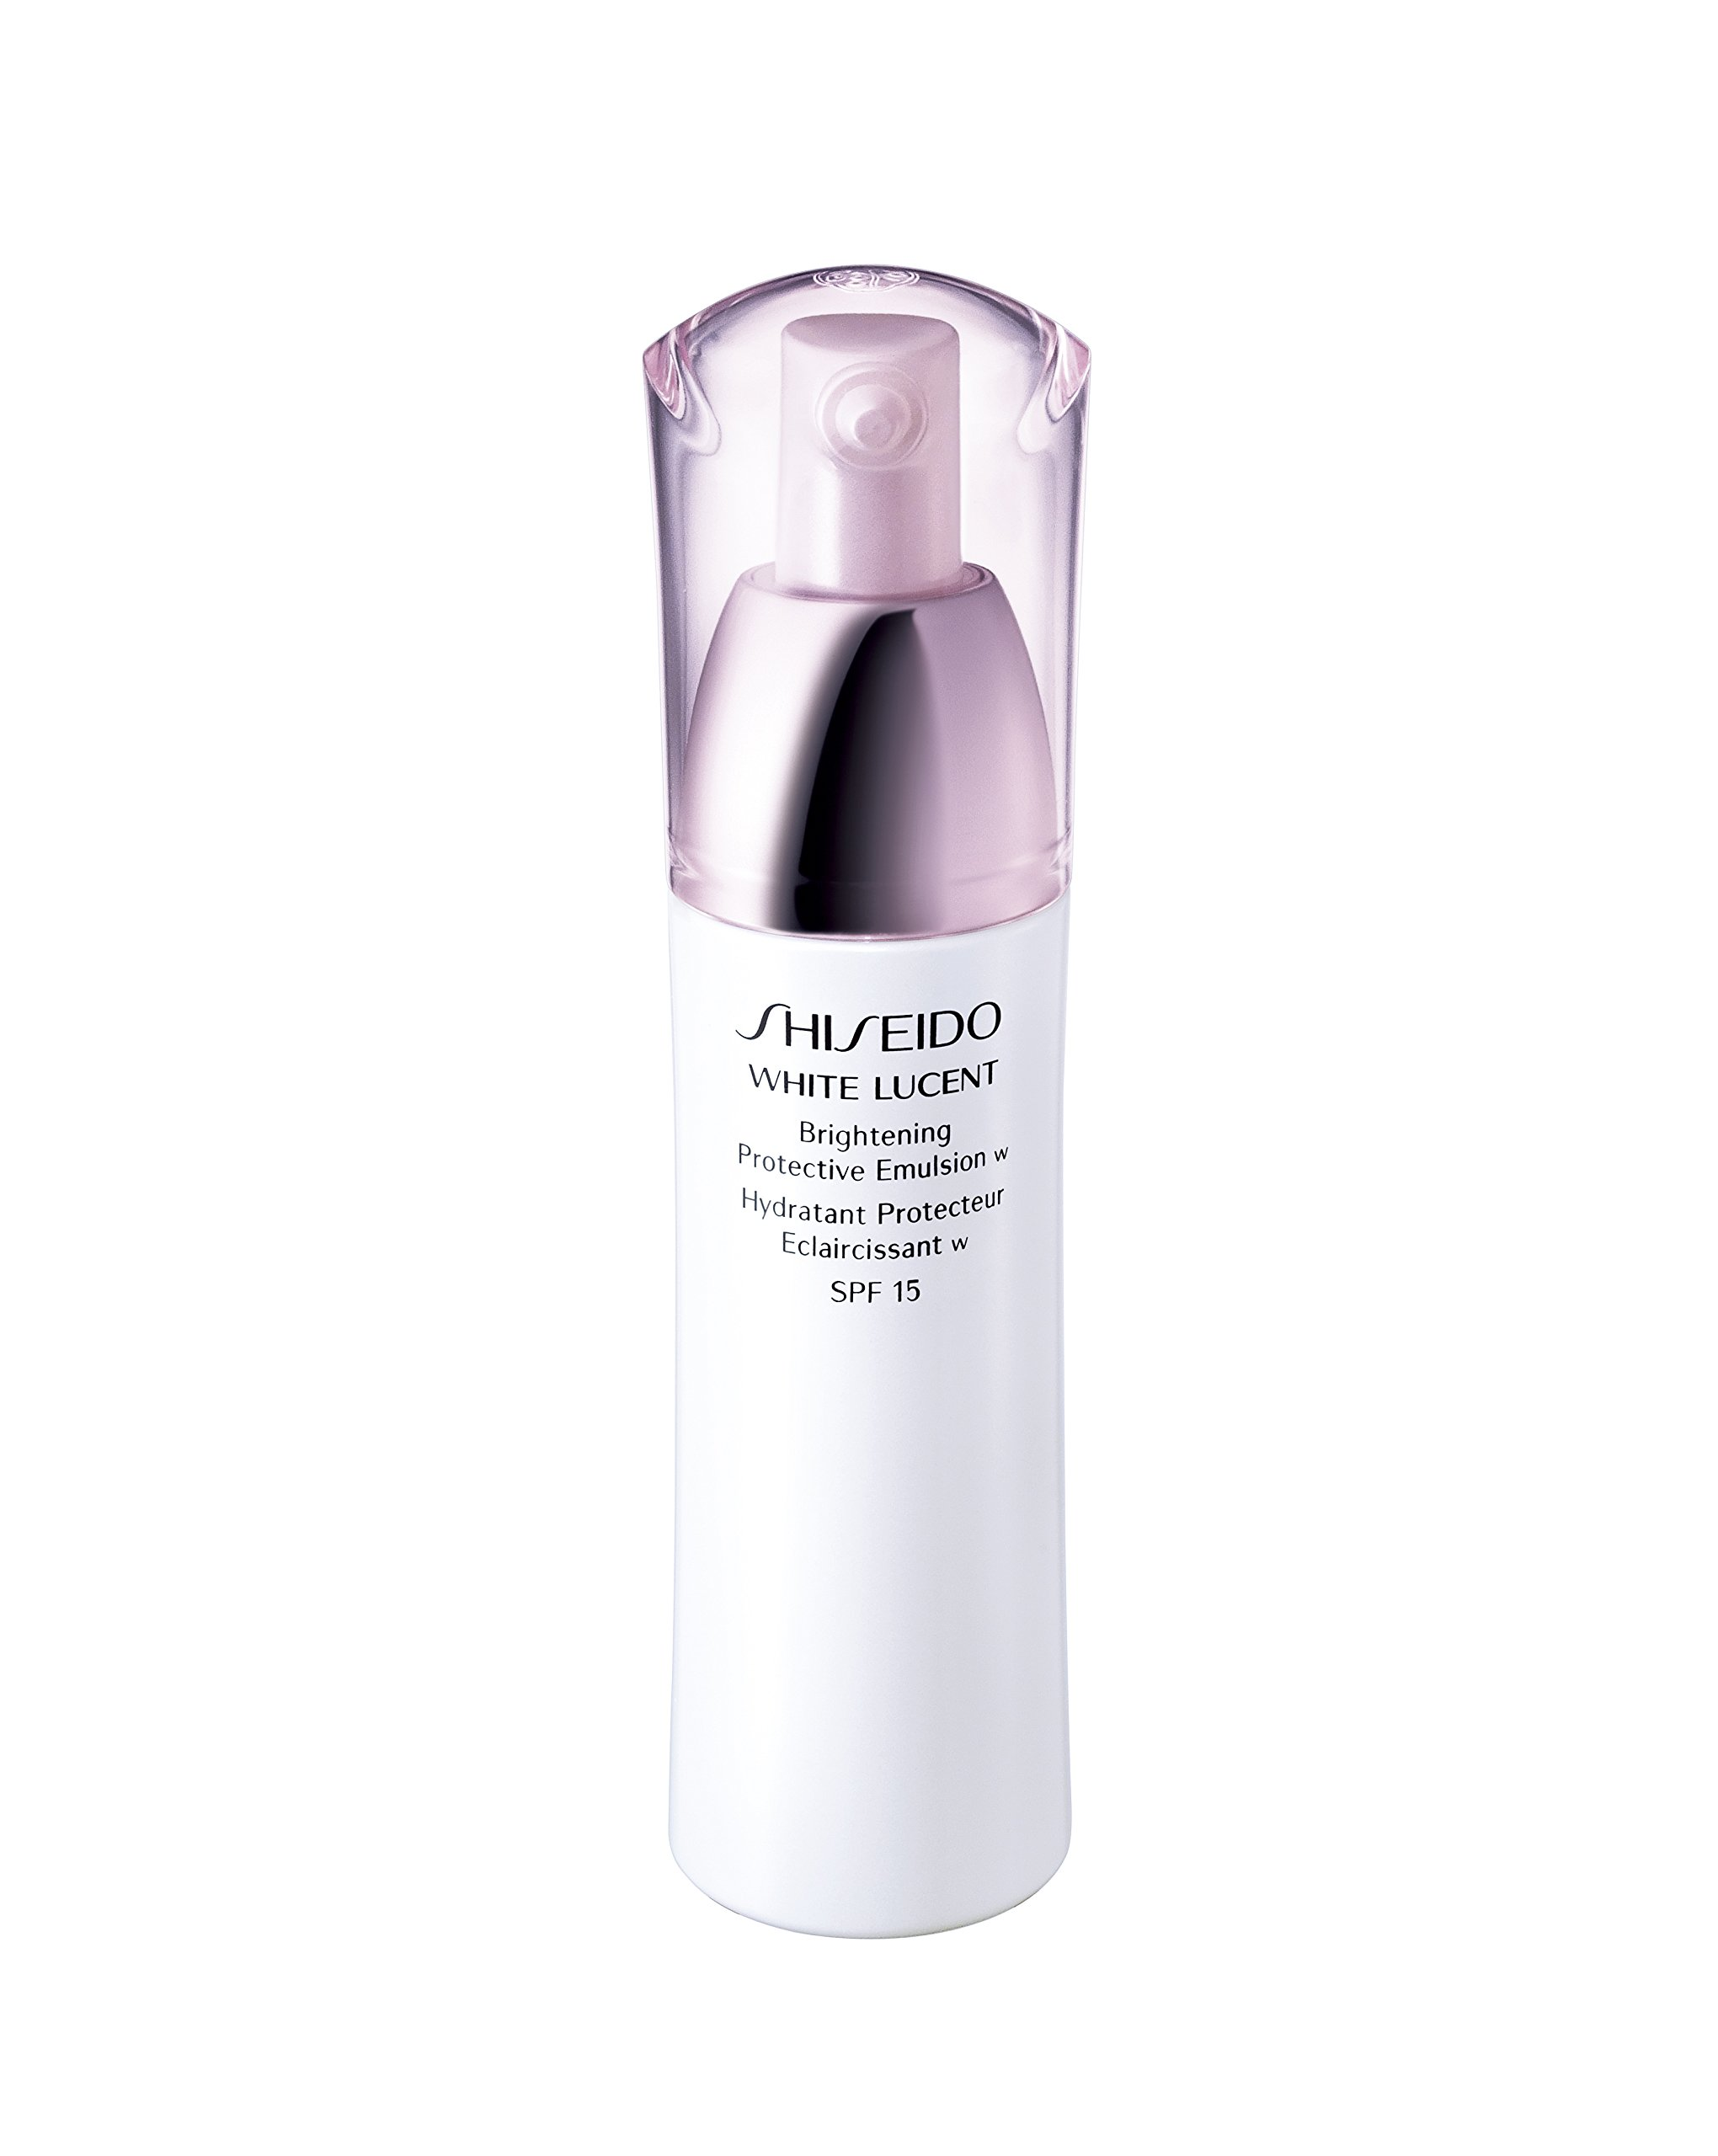 Shiseido White Lucent Brightening Protective Emulsion W SPF 18 75ml/2.5oz